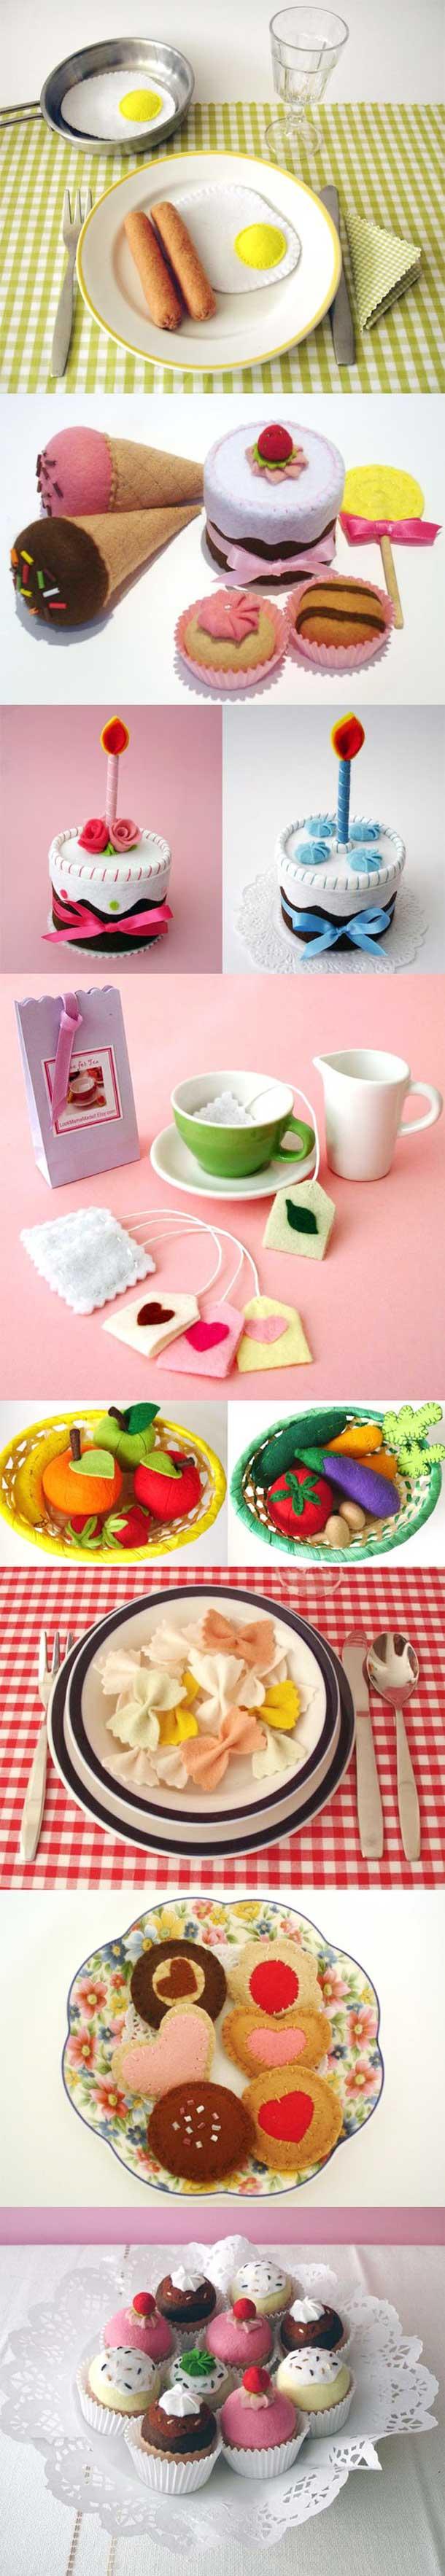 Brinquedo de comida com feltro